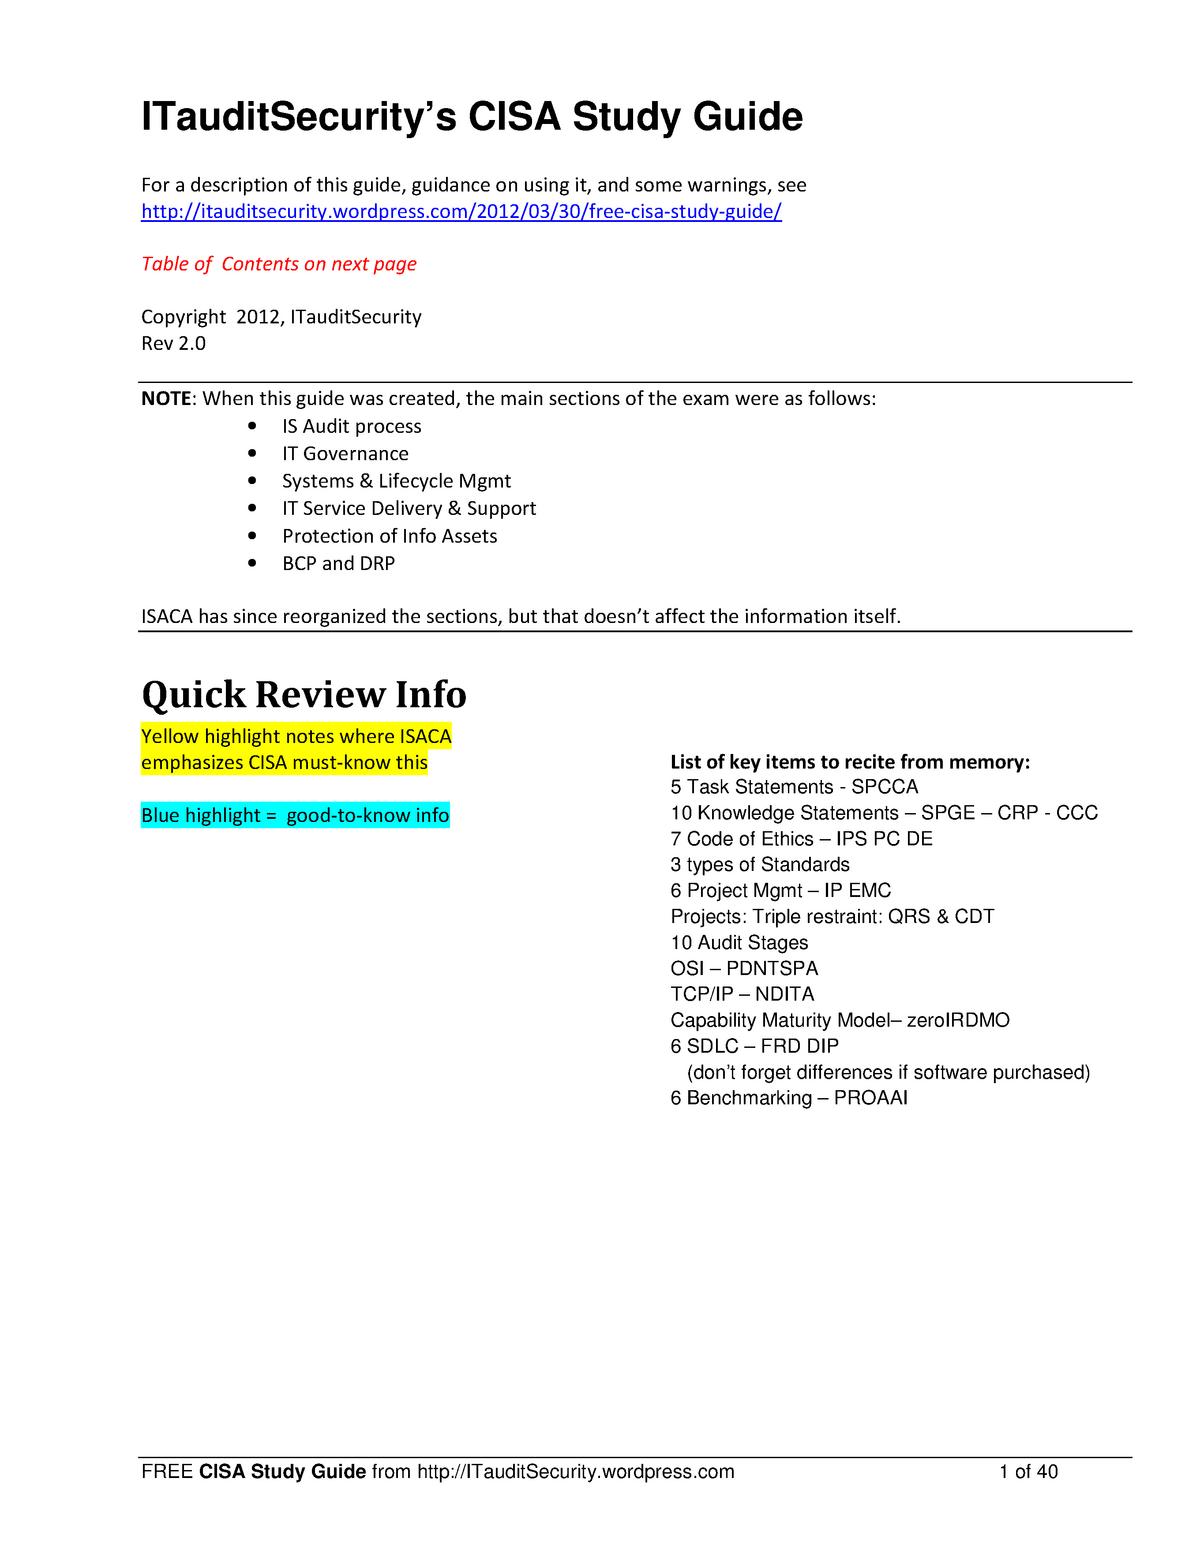 Free CISA Study Guide - Public Law - PolyU - StuDocu